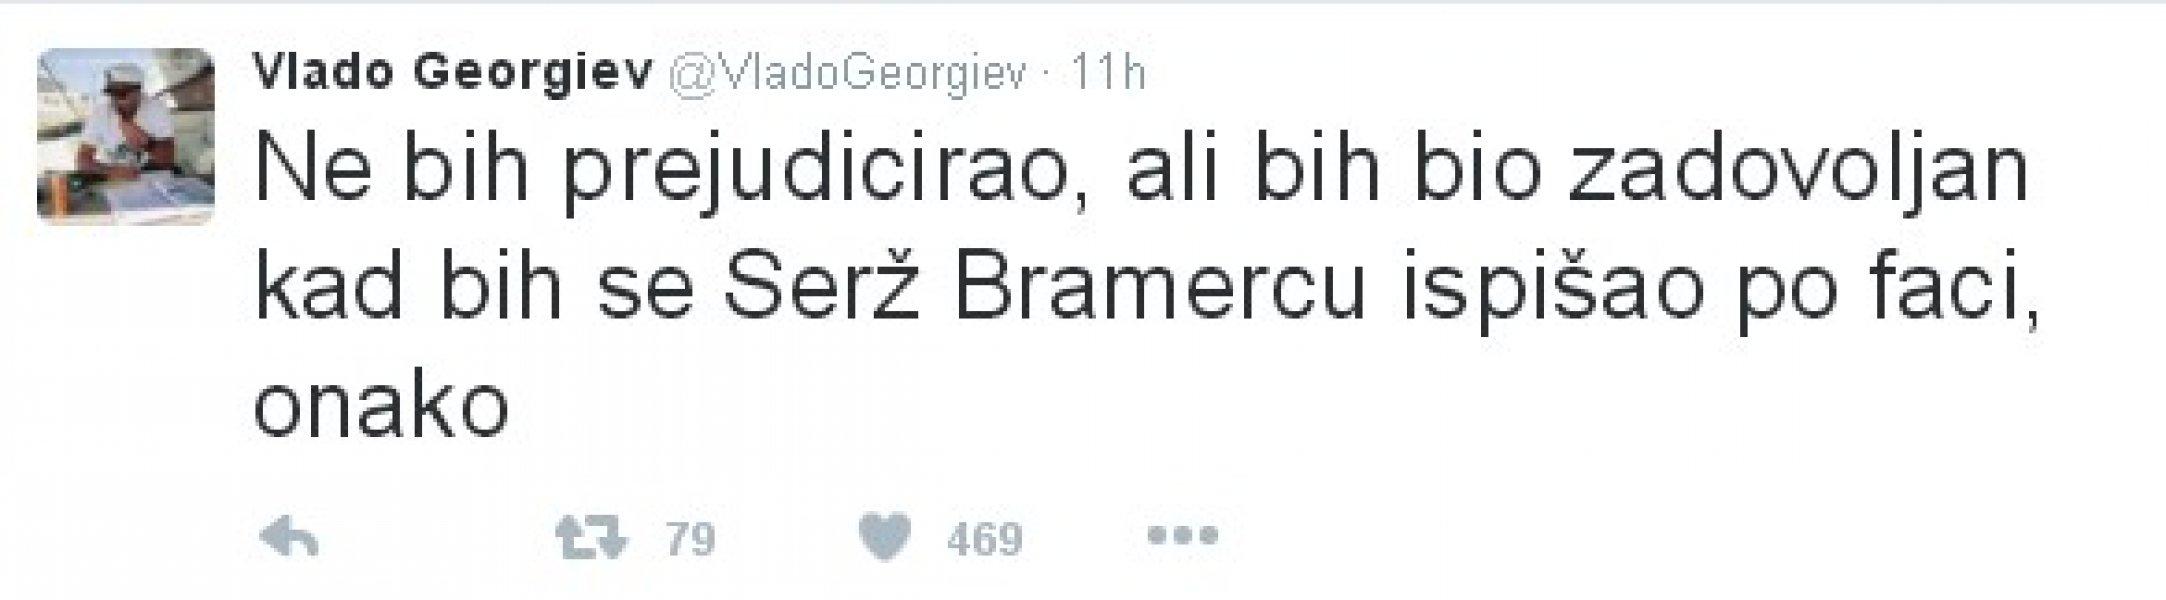 vlado-georgiev-twitter1